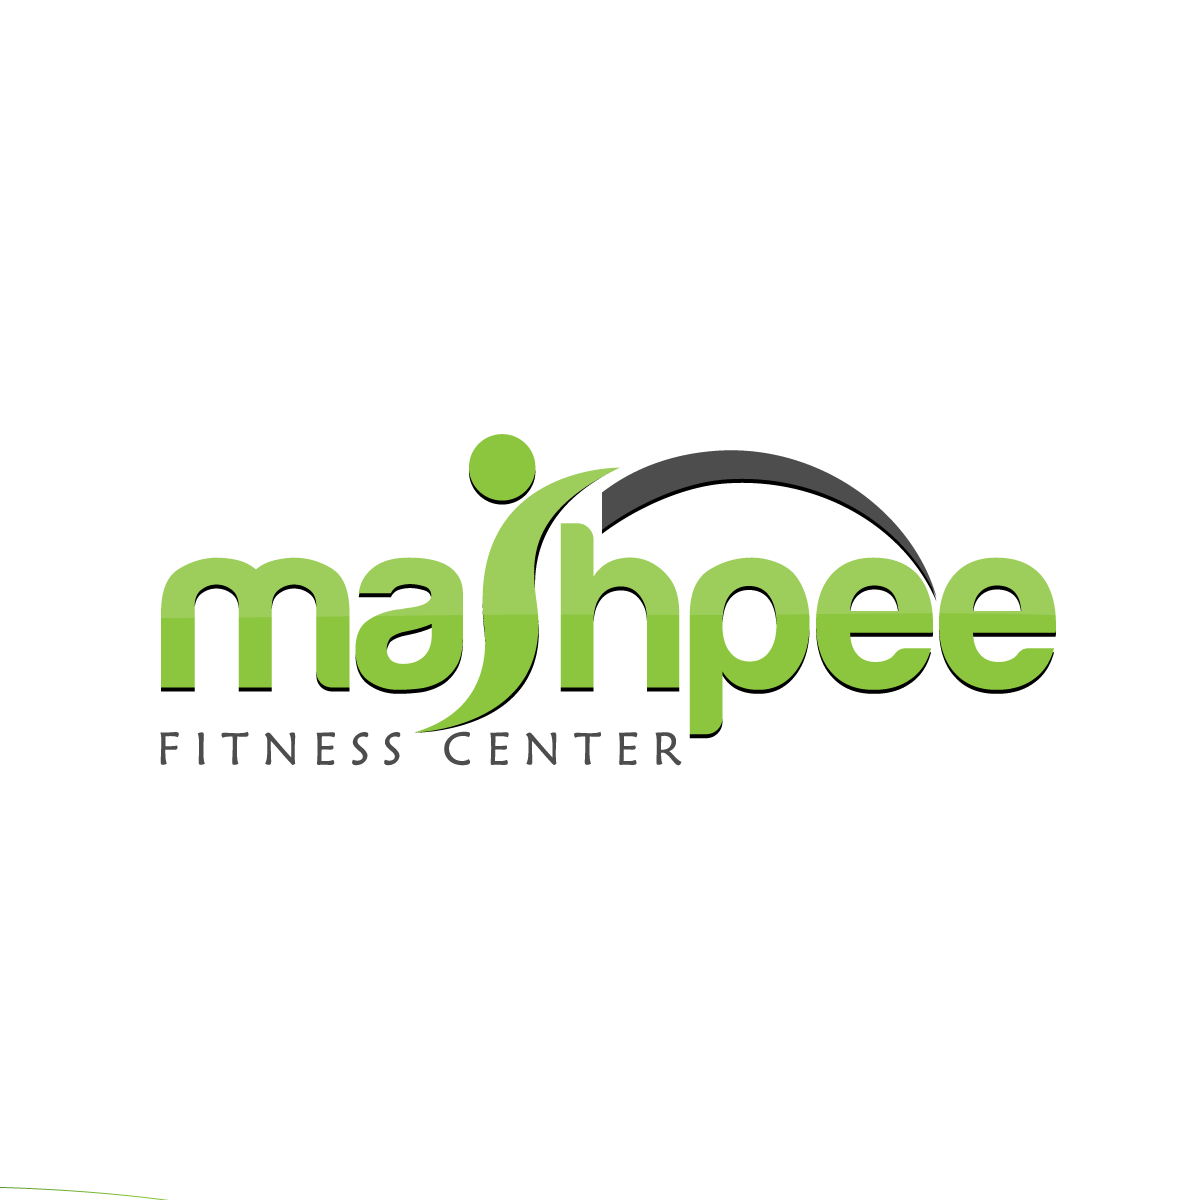 Logo Design by rockin - Entry No. 5 in the Logo Design Contest New Logo Design for Mashpee Fitness Center.